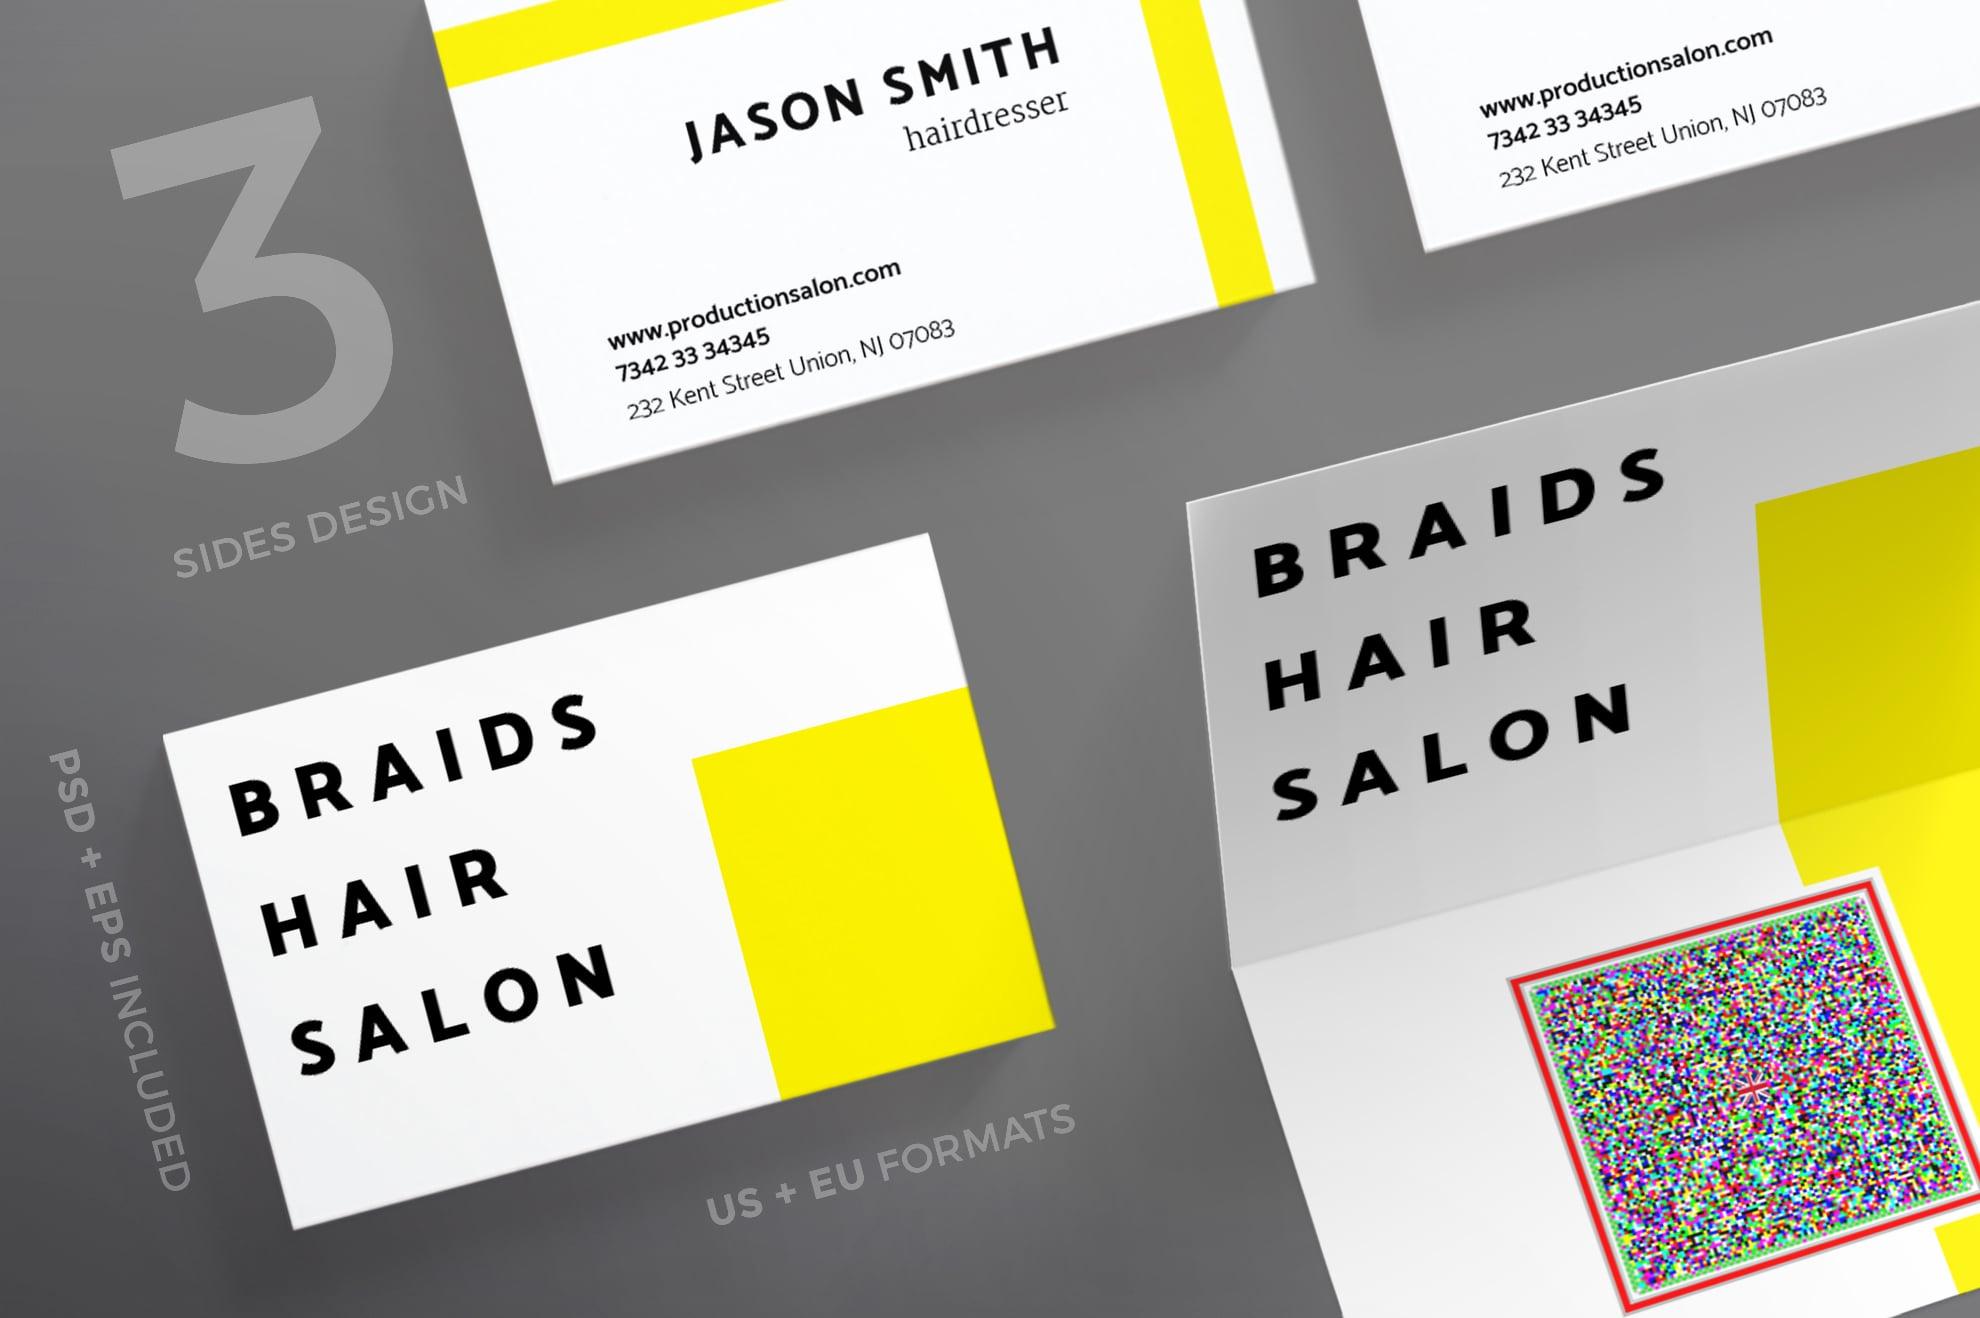 110 in 1 Business Card Bundle - 020 bc braids hair salon 44 0